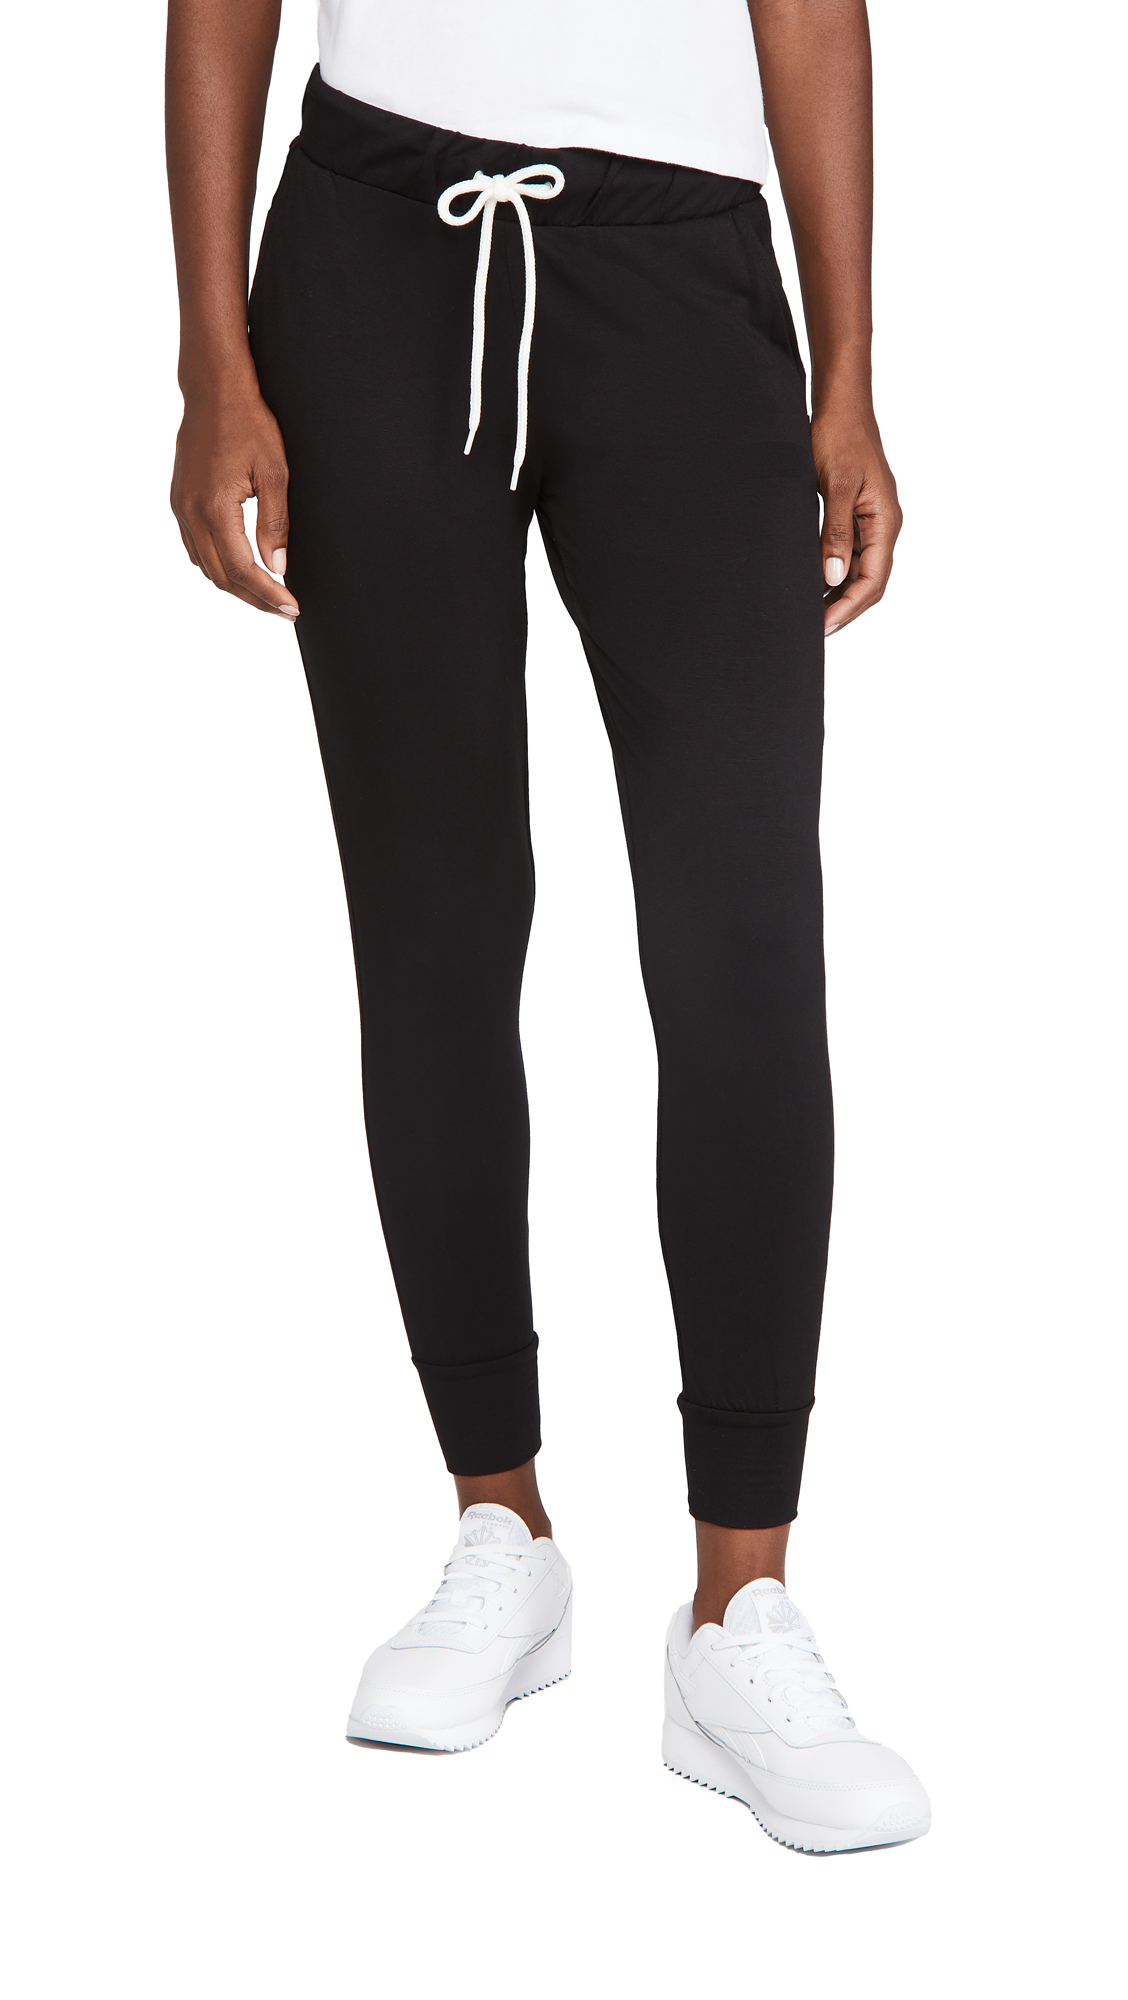 Z Supply Jogger Sweatpants